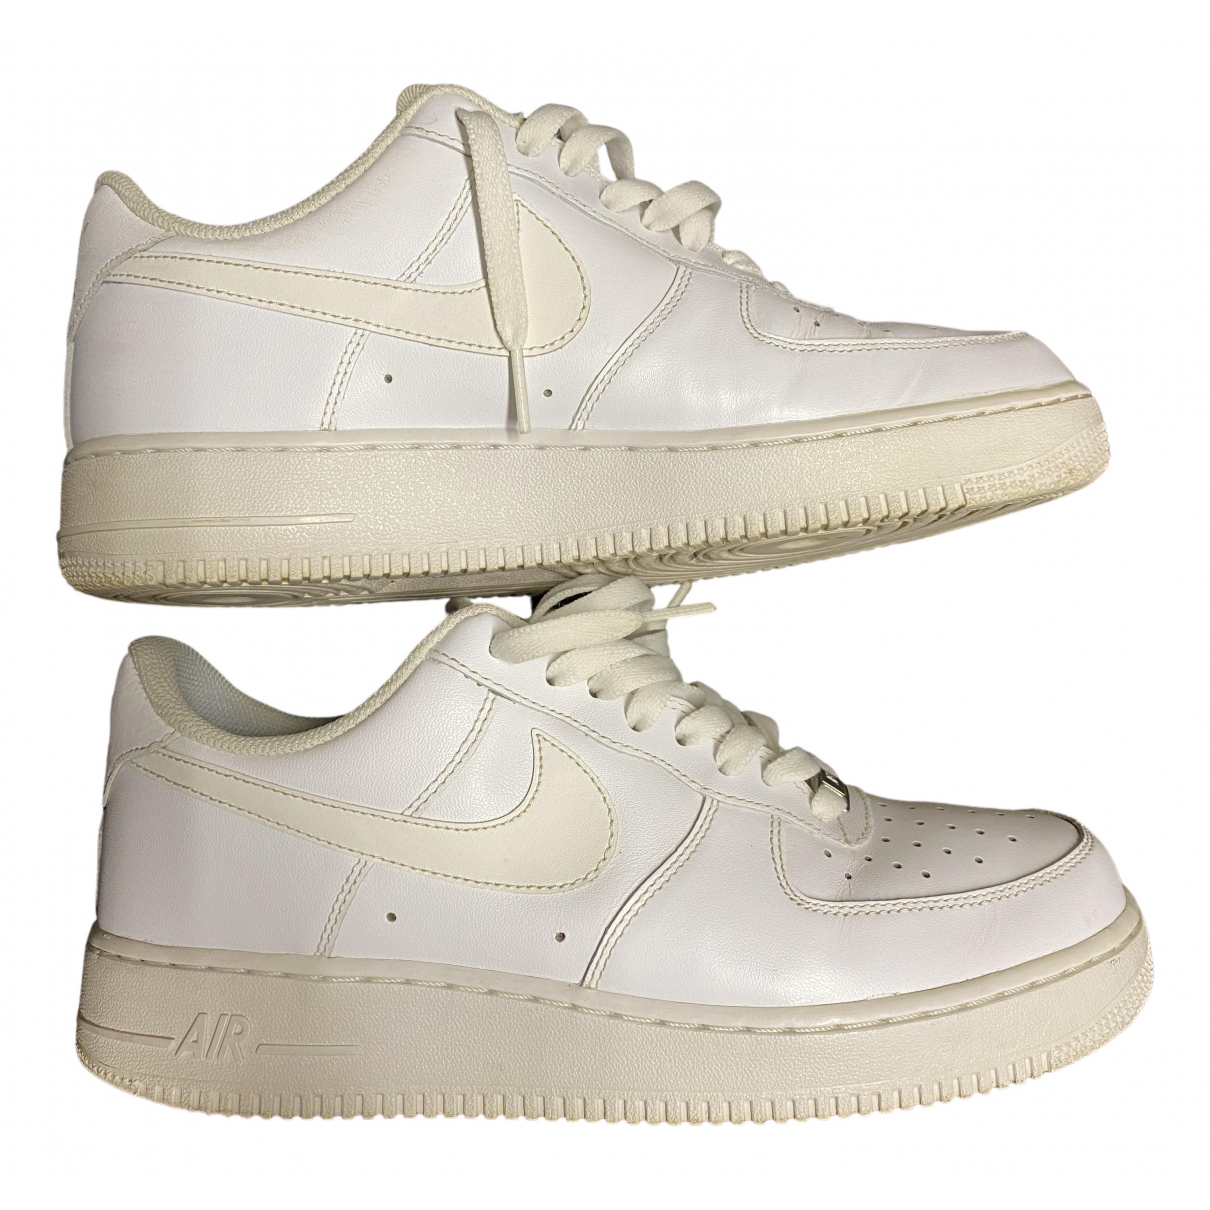 Nike - Baskets Air Force 1 pour homme en cuir - blanc